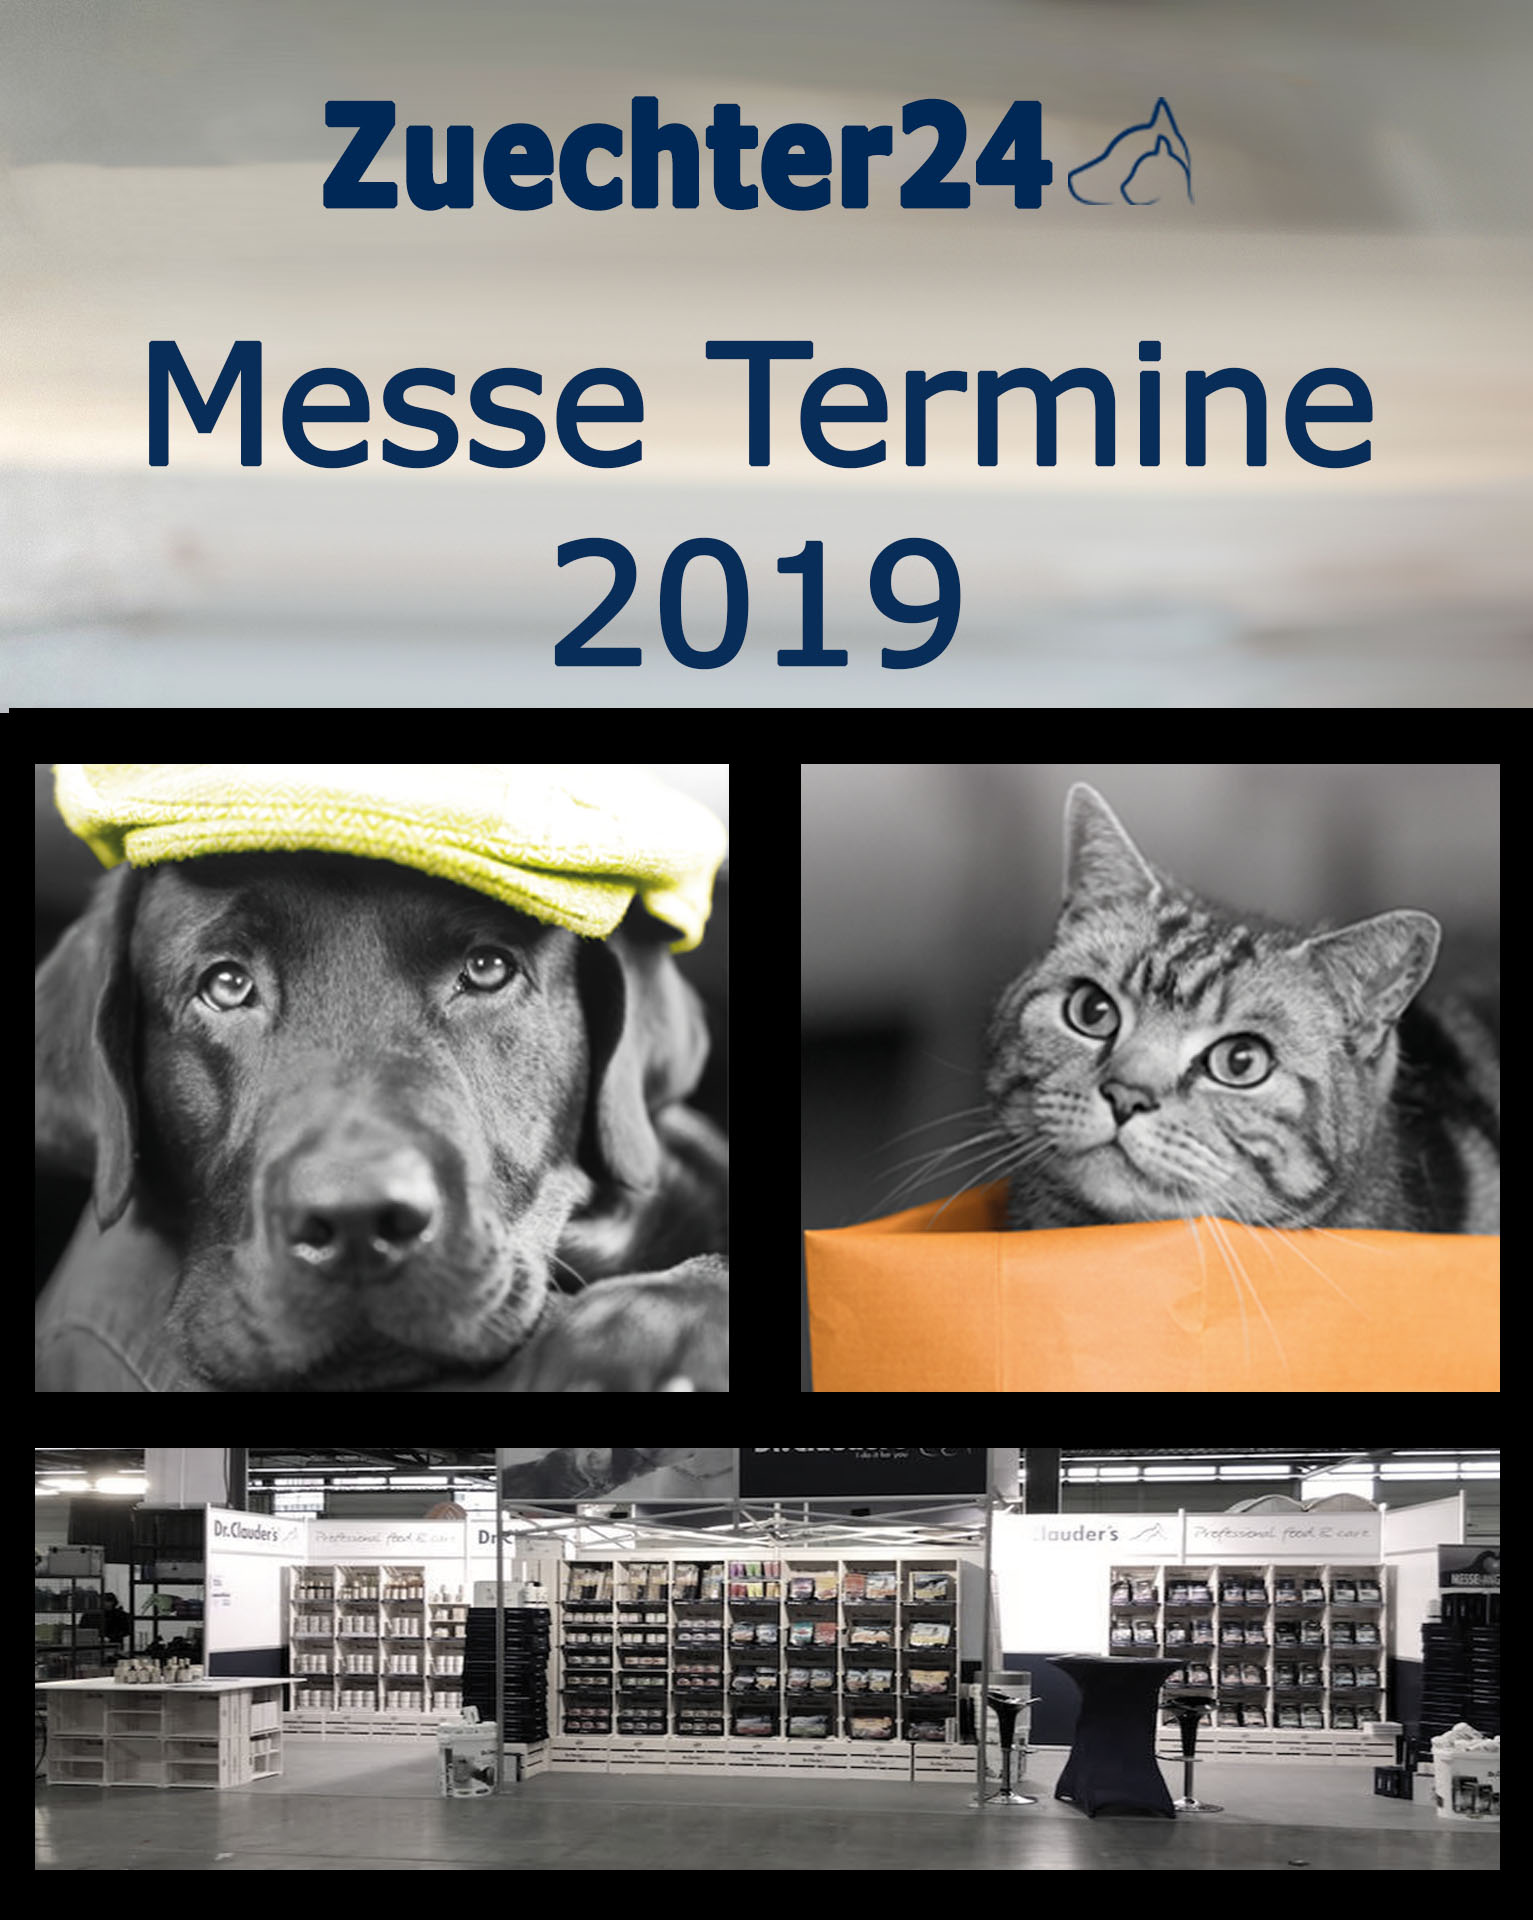 Messe Termine 2019